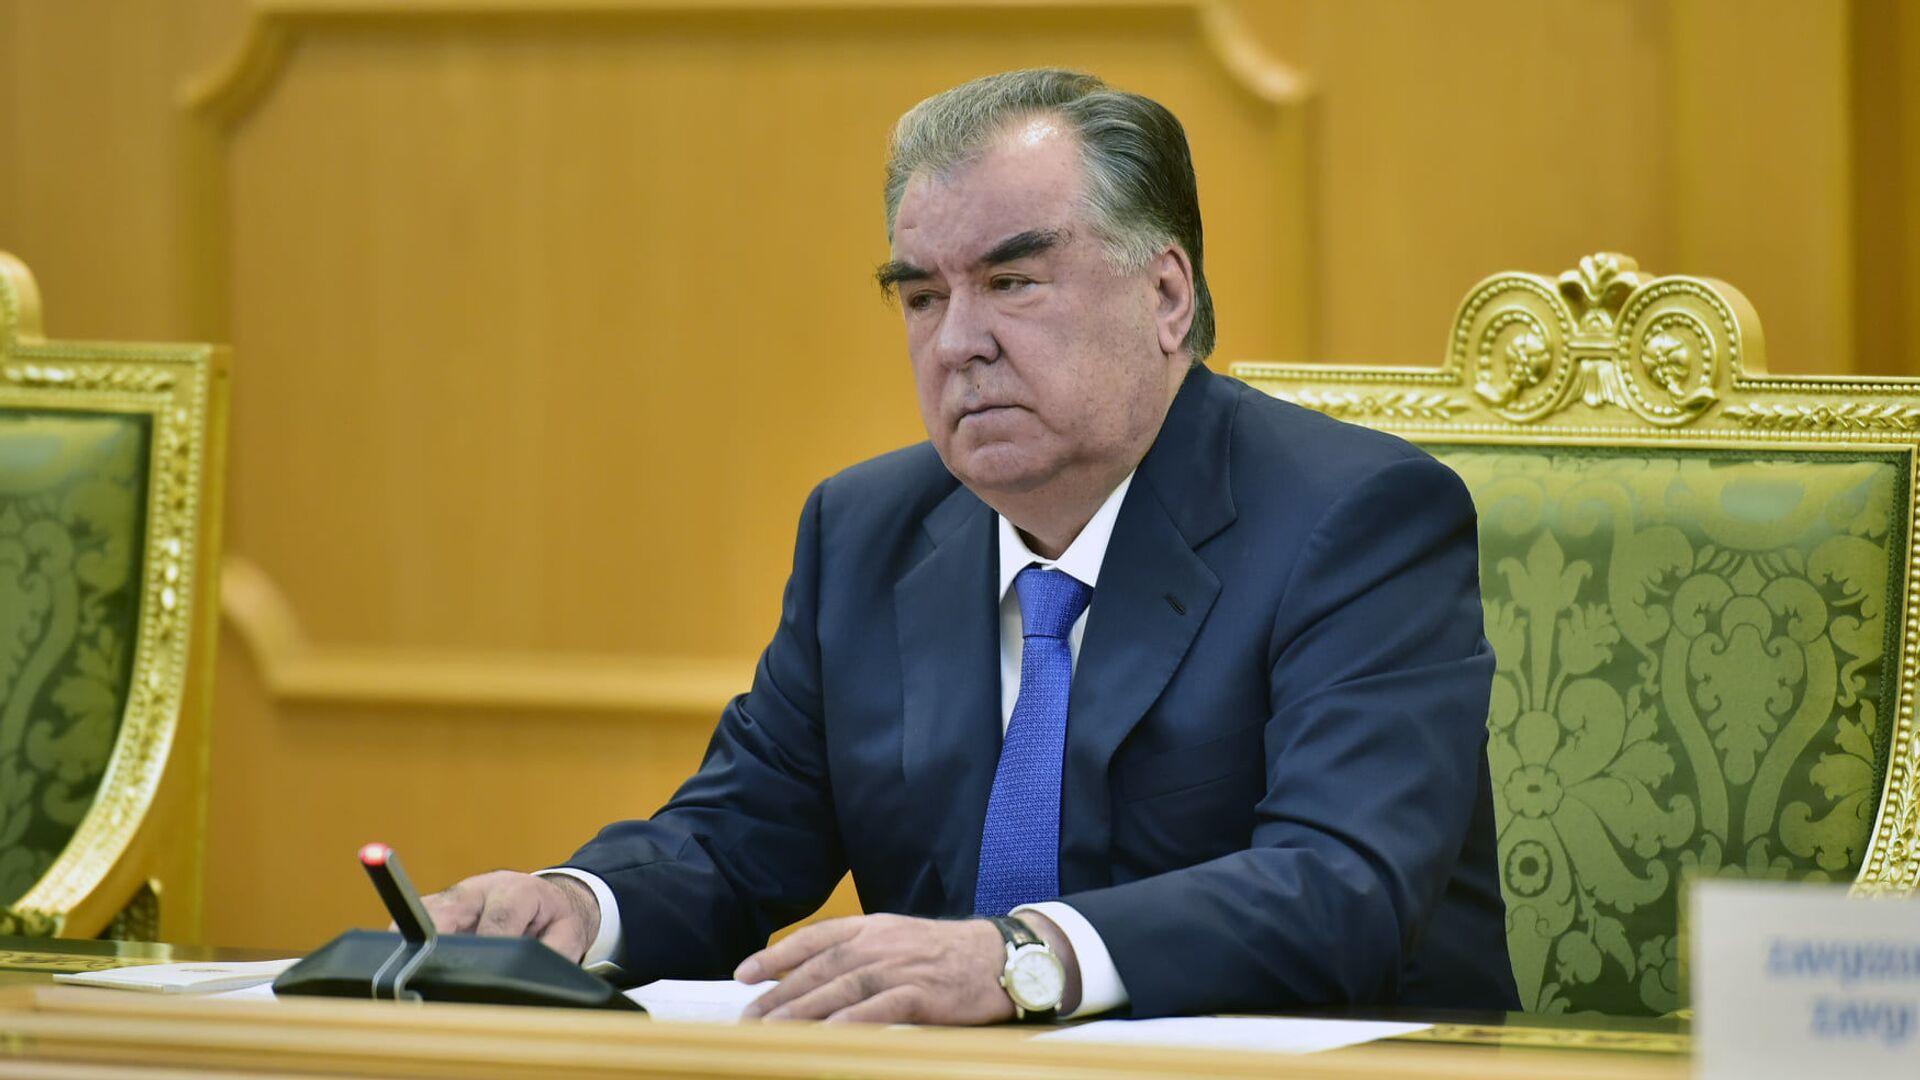 Президент Республики Таджикистан Эмомали Рахмон - Sputnik Тоҷикистон, 1920, 07.04.2021